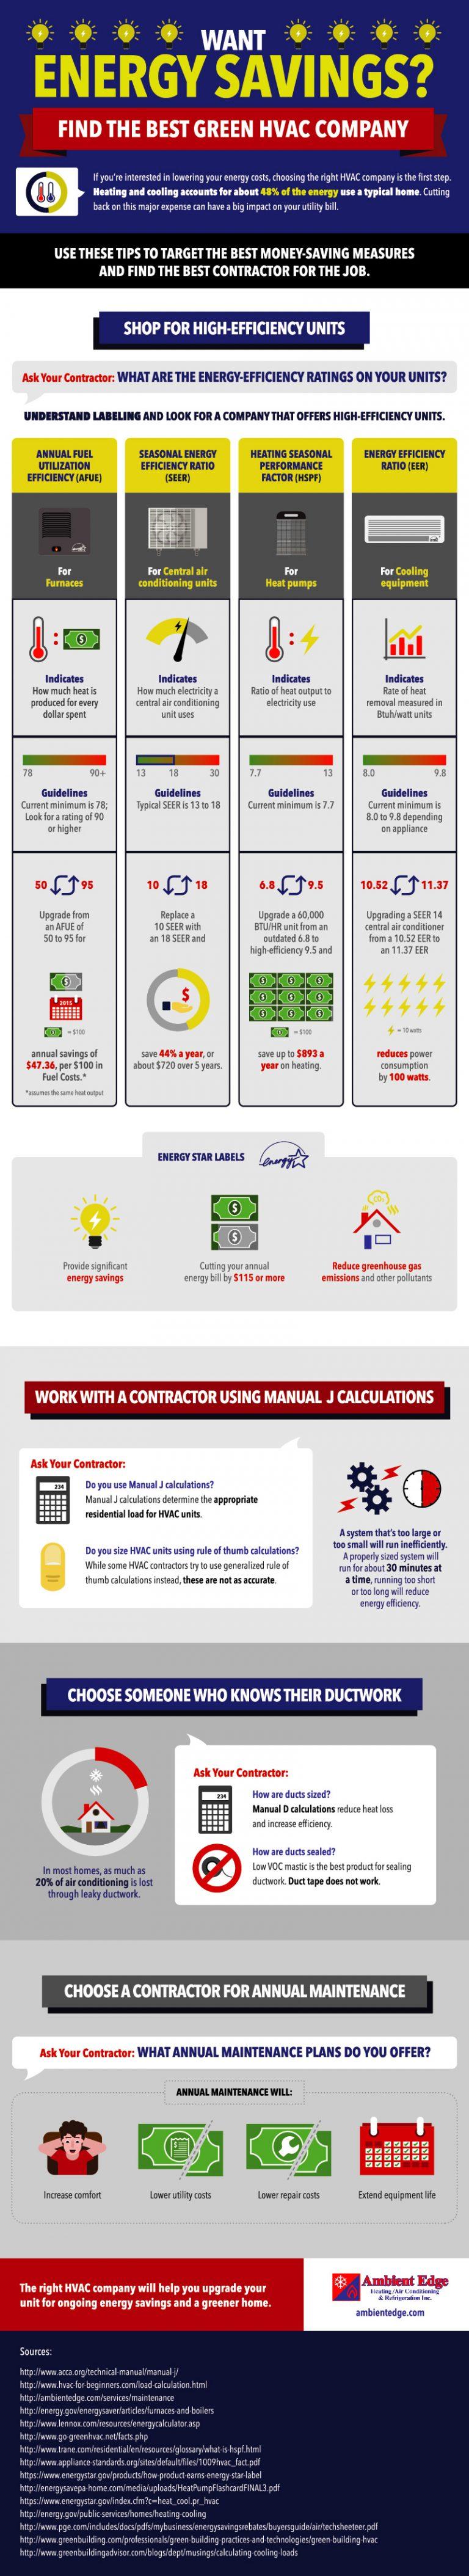 energy-savings-green-HVAC-infographic-768x4217